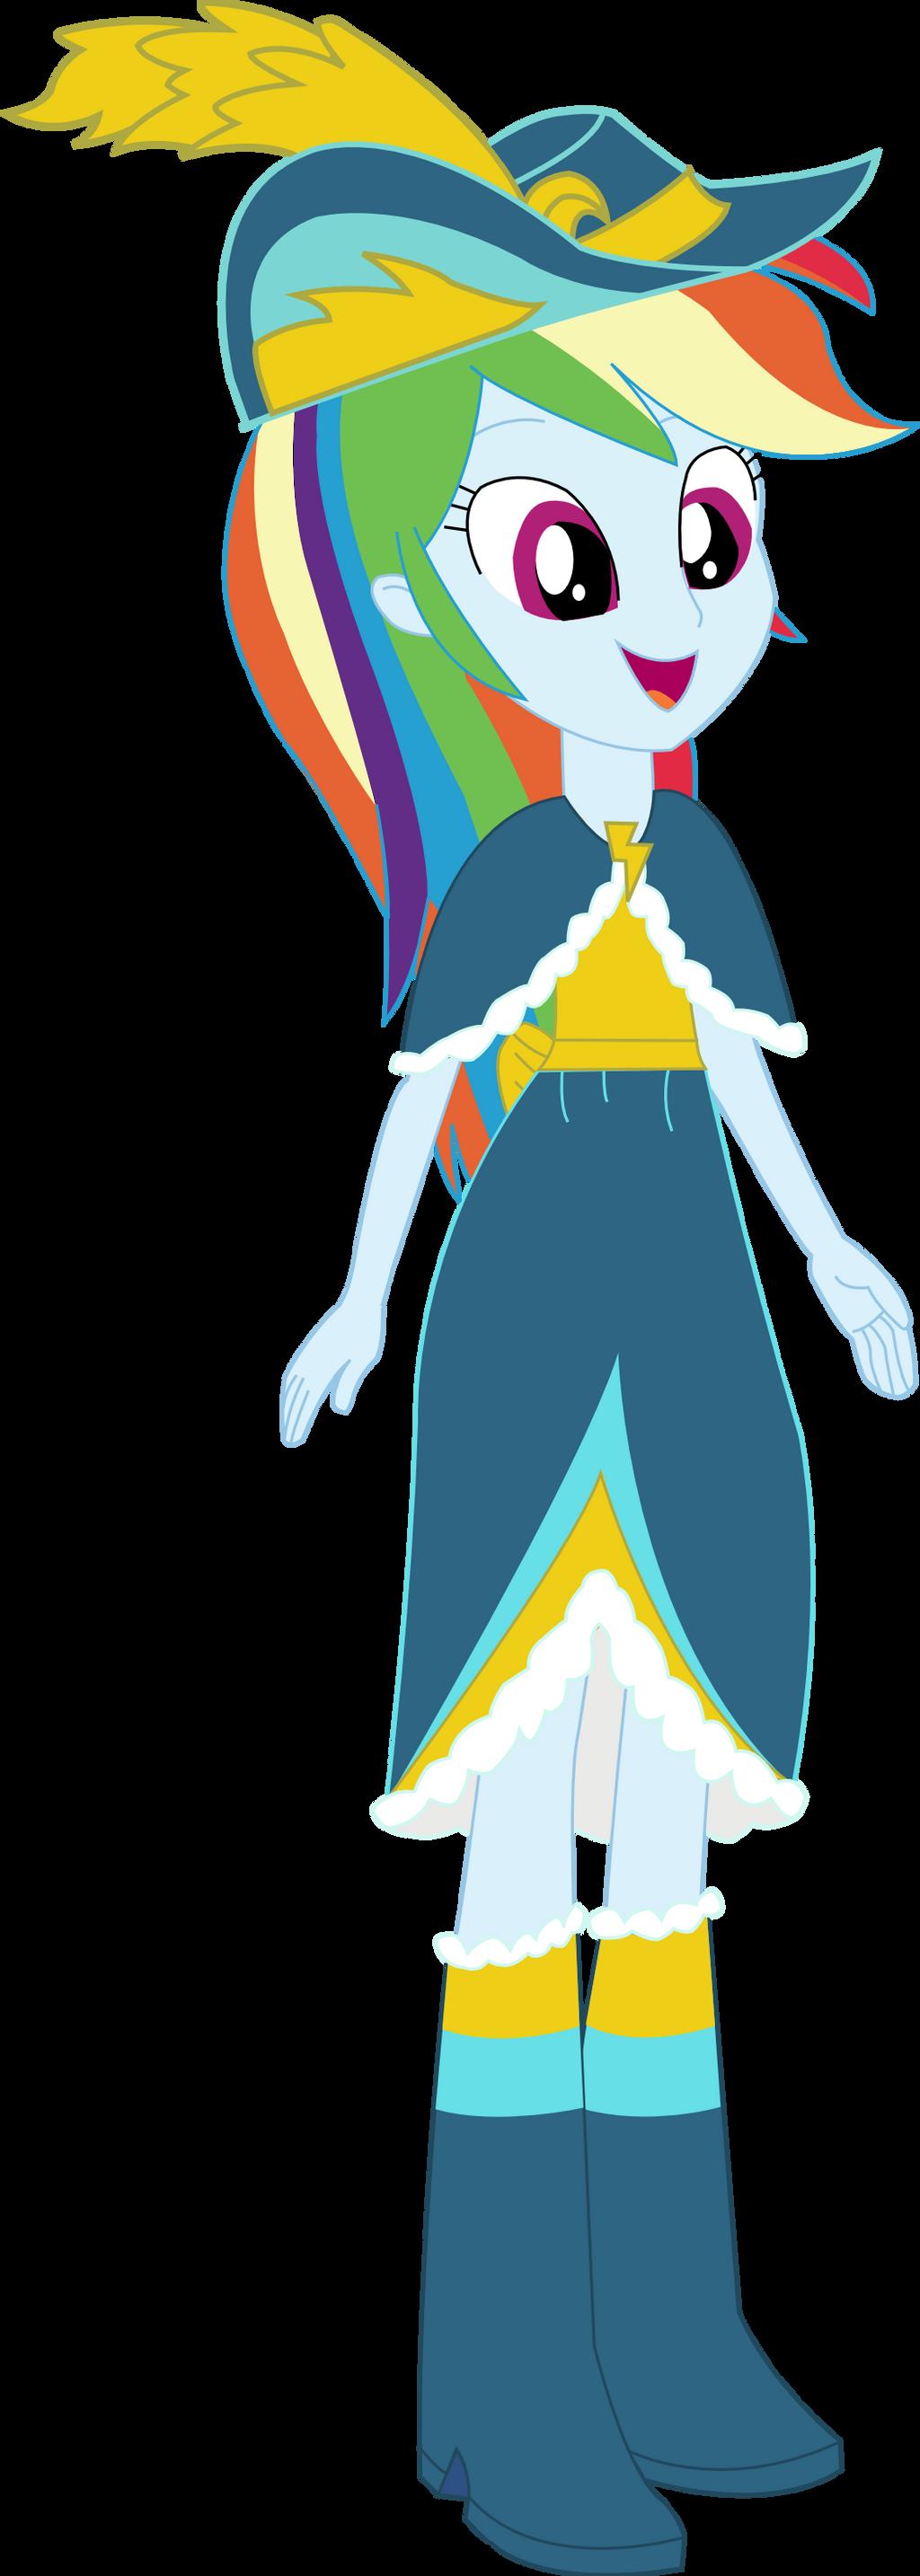 Equestria Girls Rainbow Dash Coronation Dress By Sketchmcreations On Deviantart